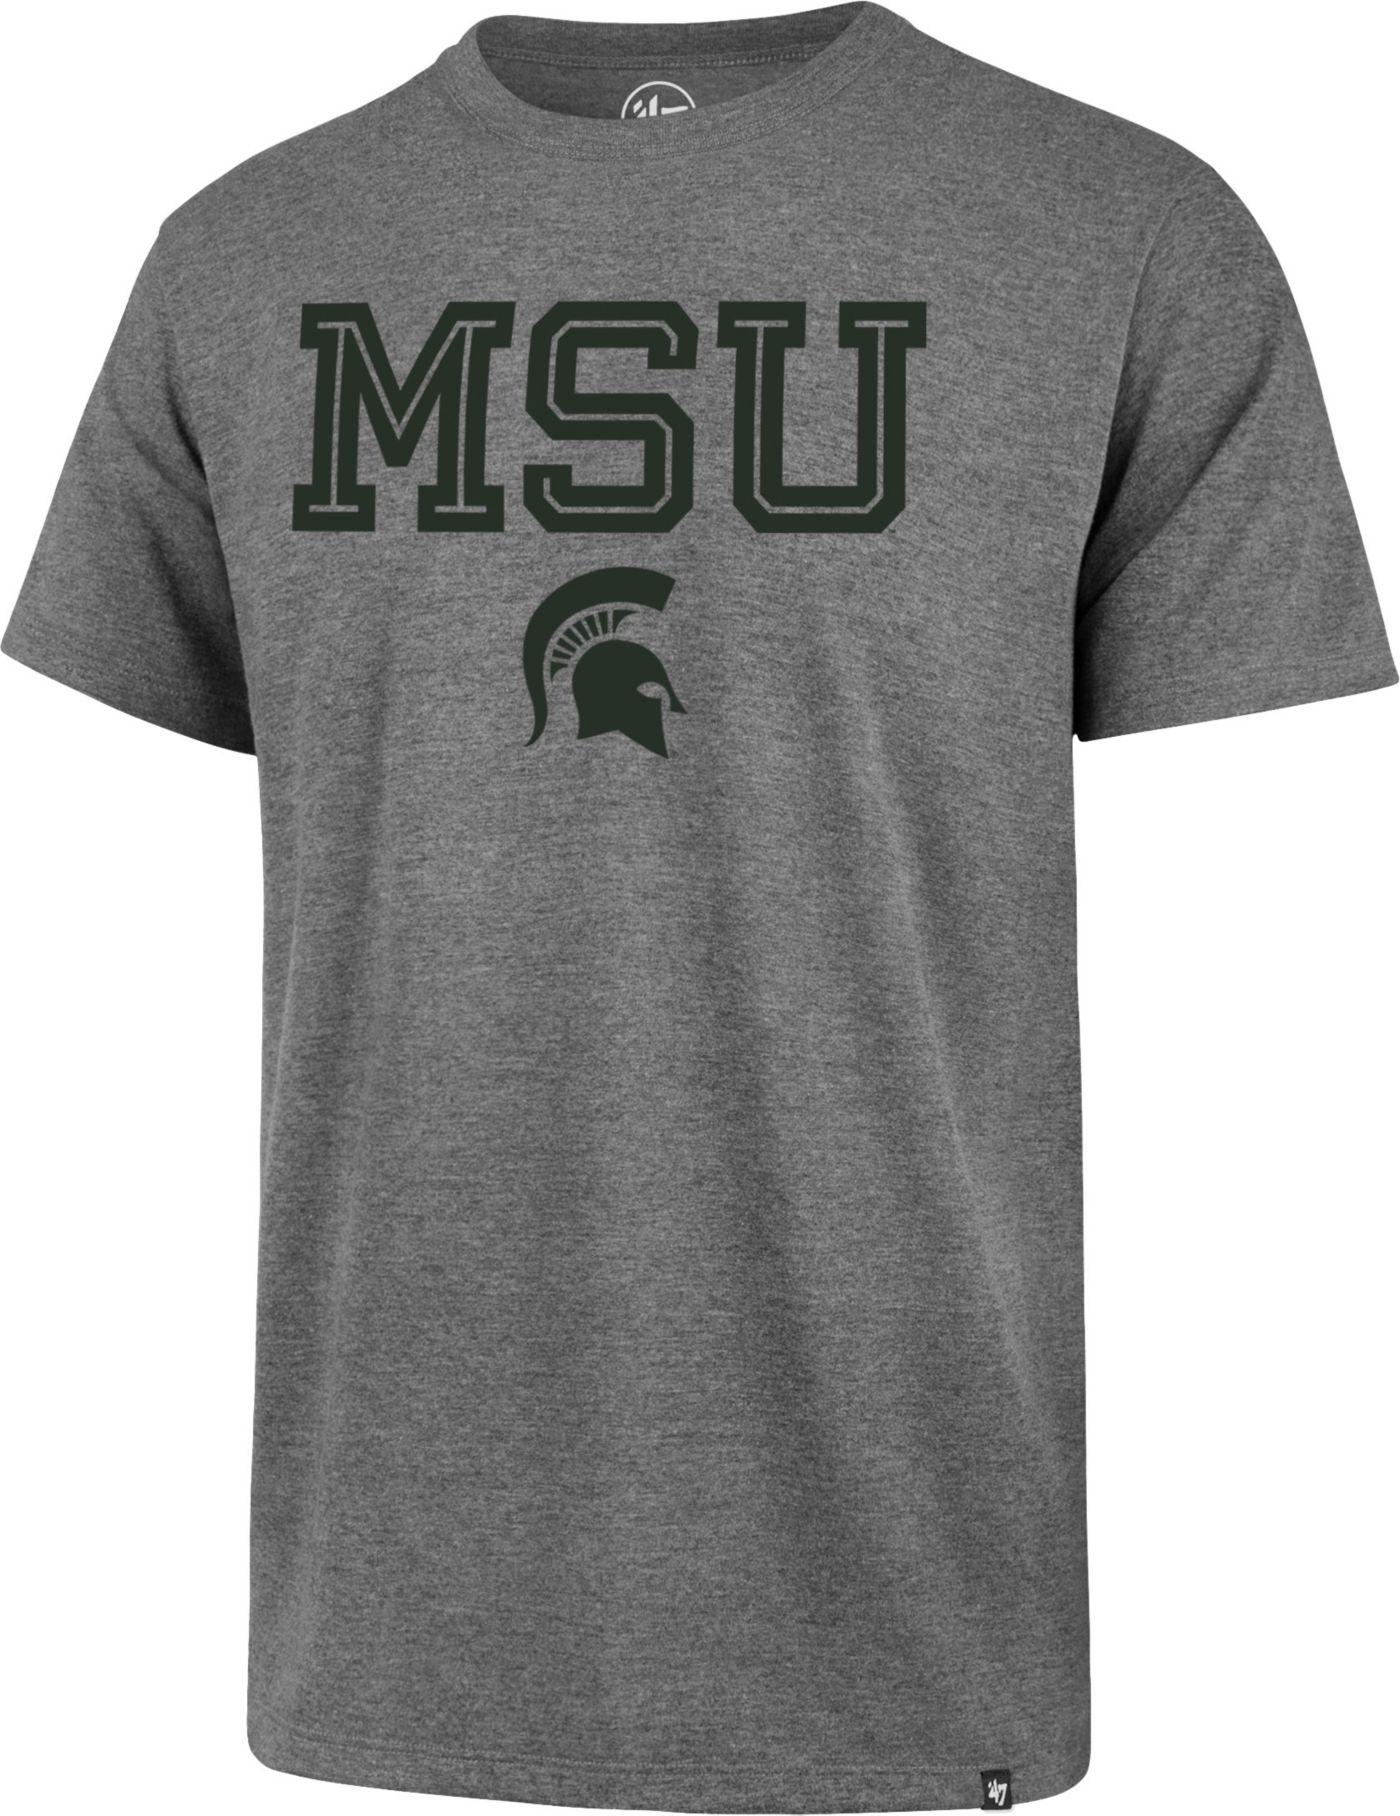 '47 Men's Michigan State Spartans Grey Inline Club T-Shirt